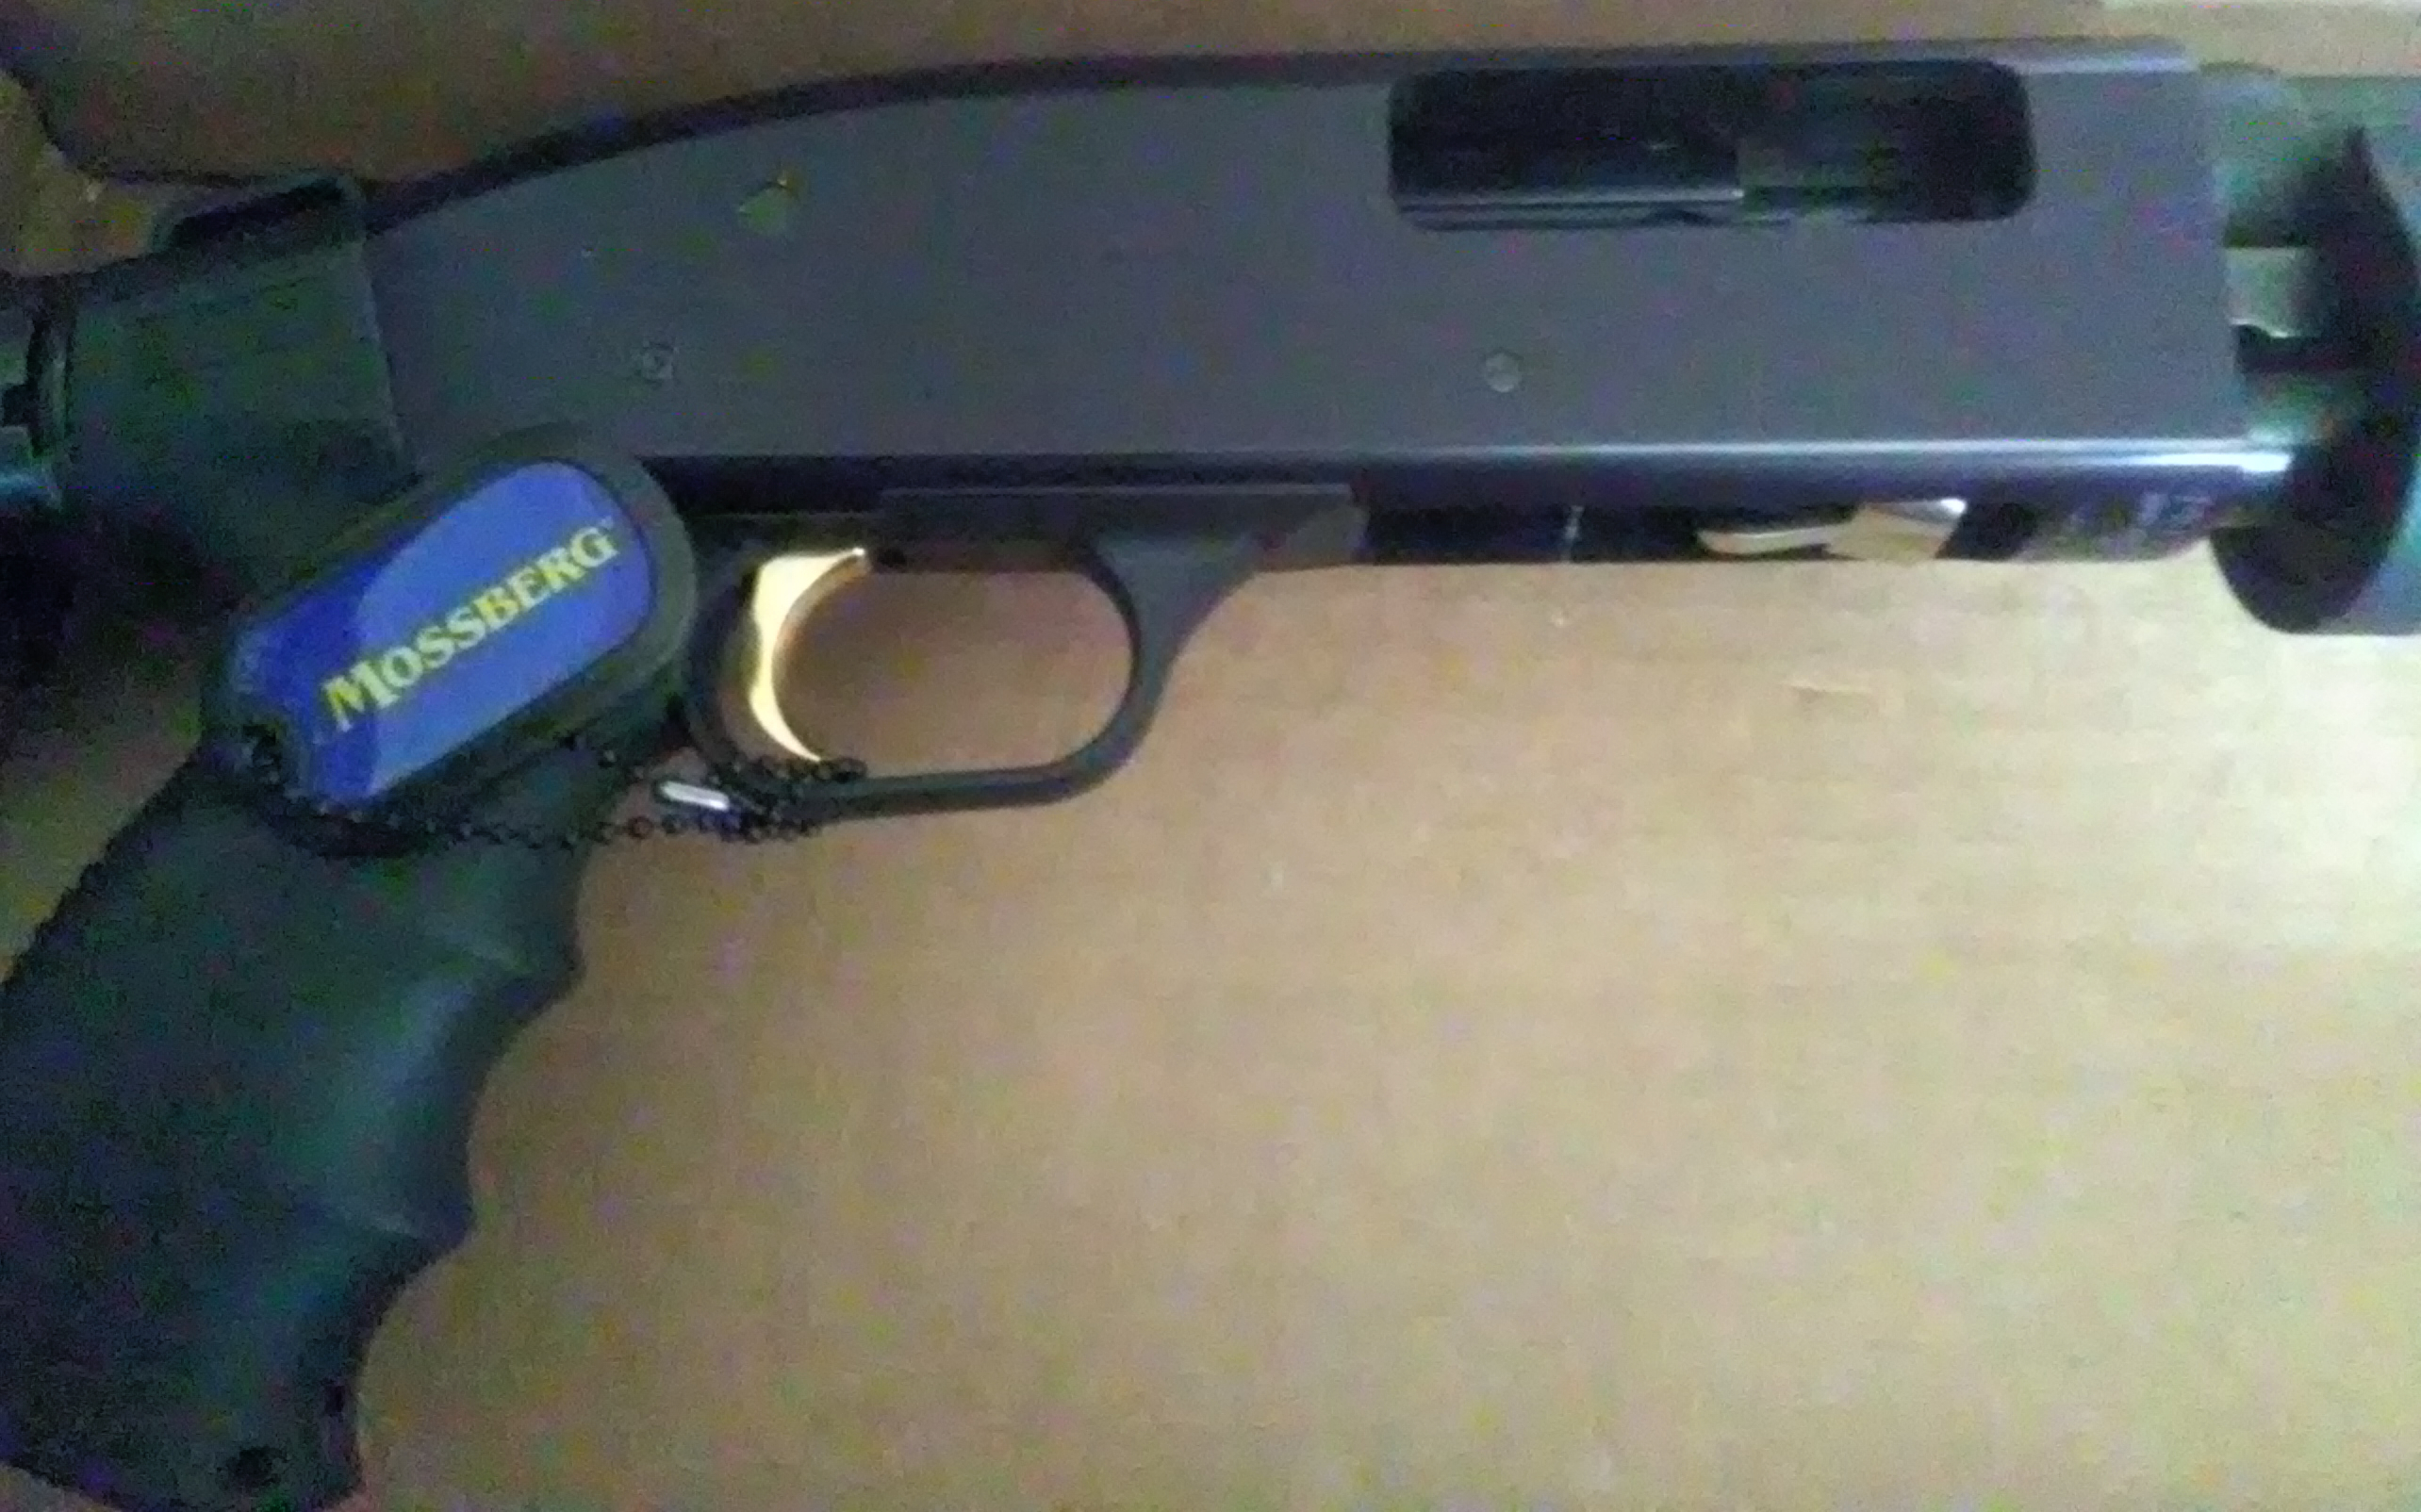 "MOSSBERG 500 20 GAUGE TACTICAL 18 5"" BARREL (Auction ID: 9344079"